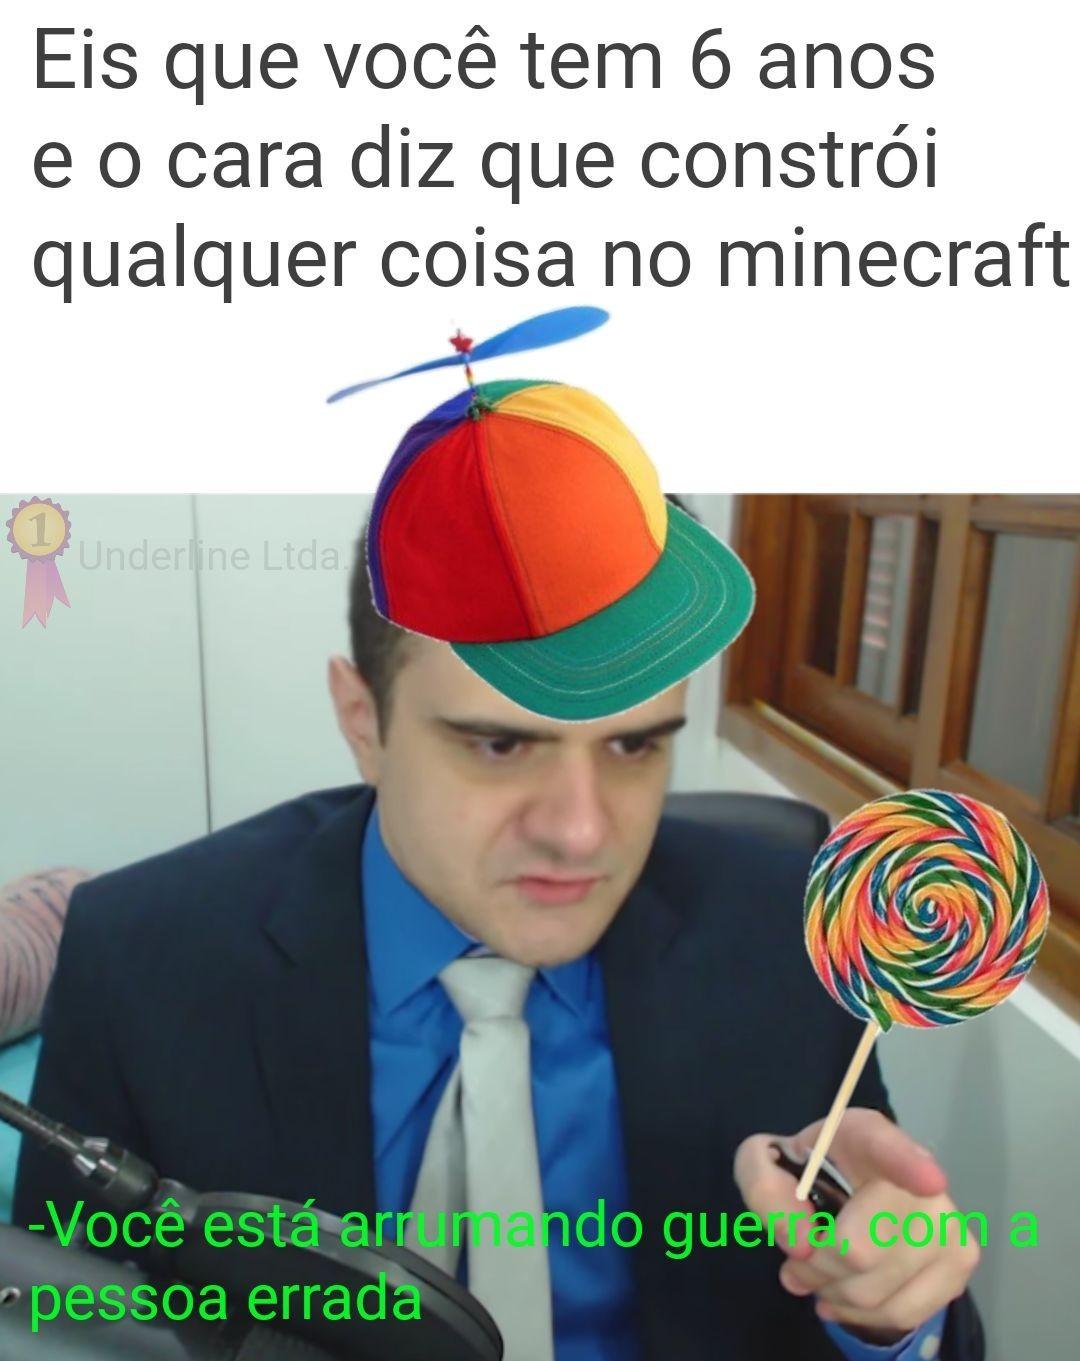 CRAFTMINE - meme